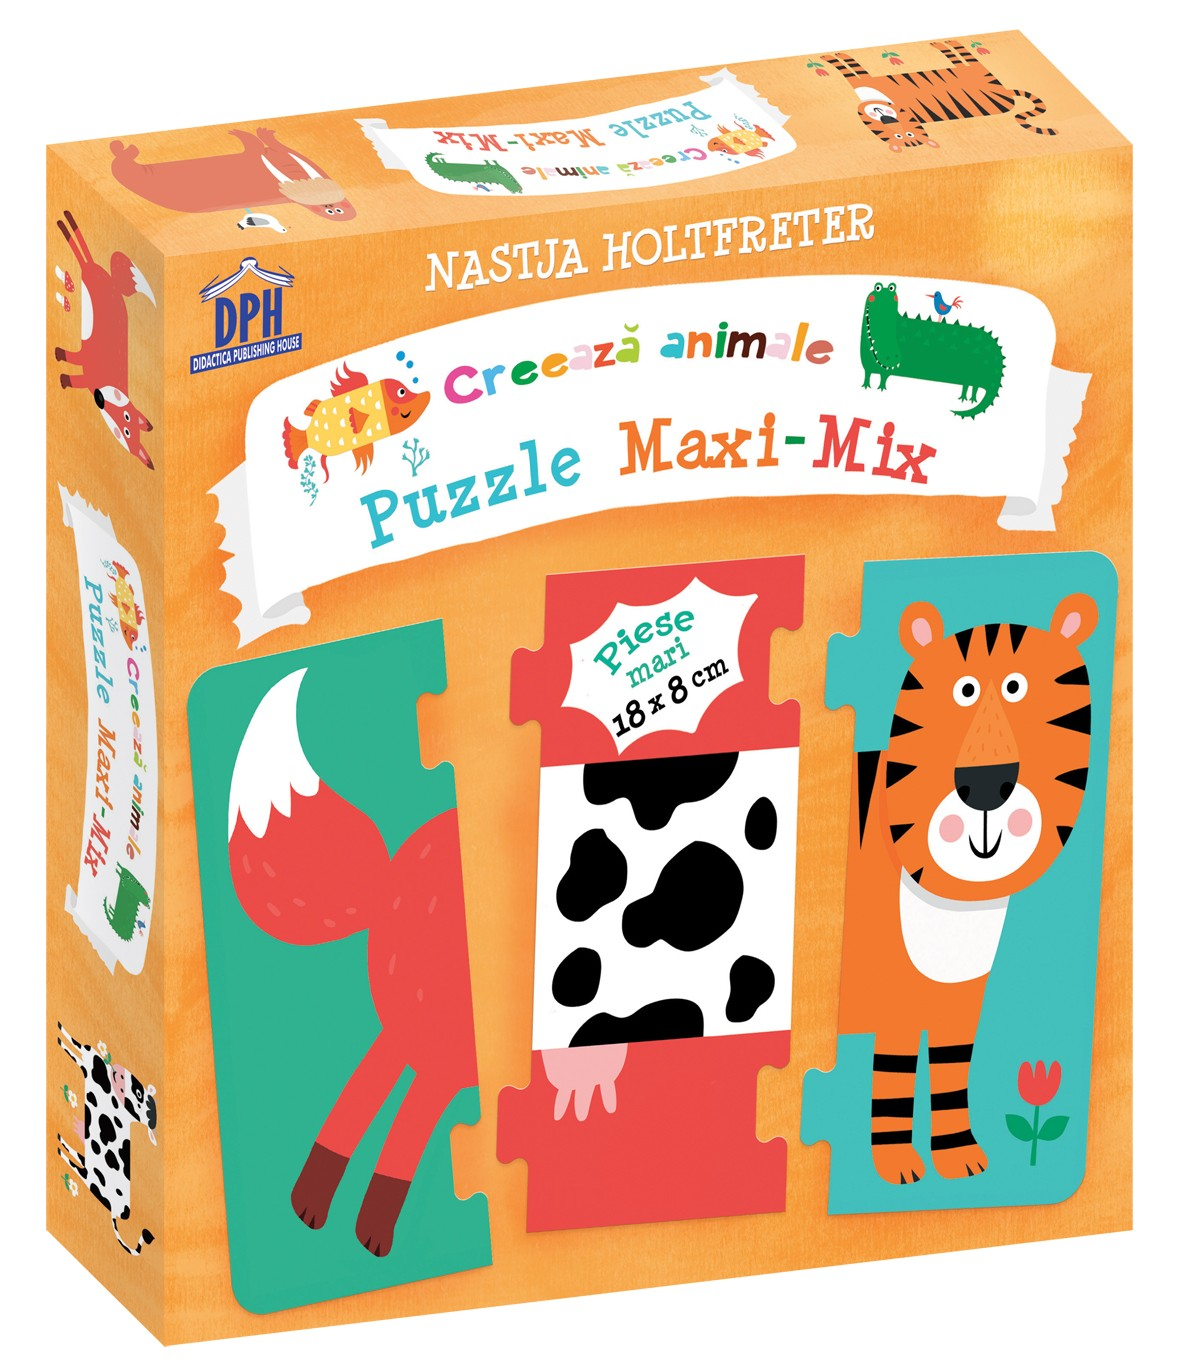 Creeaza animale - Puzzle Maxi-Mix | Didactica Publishing House